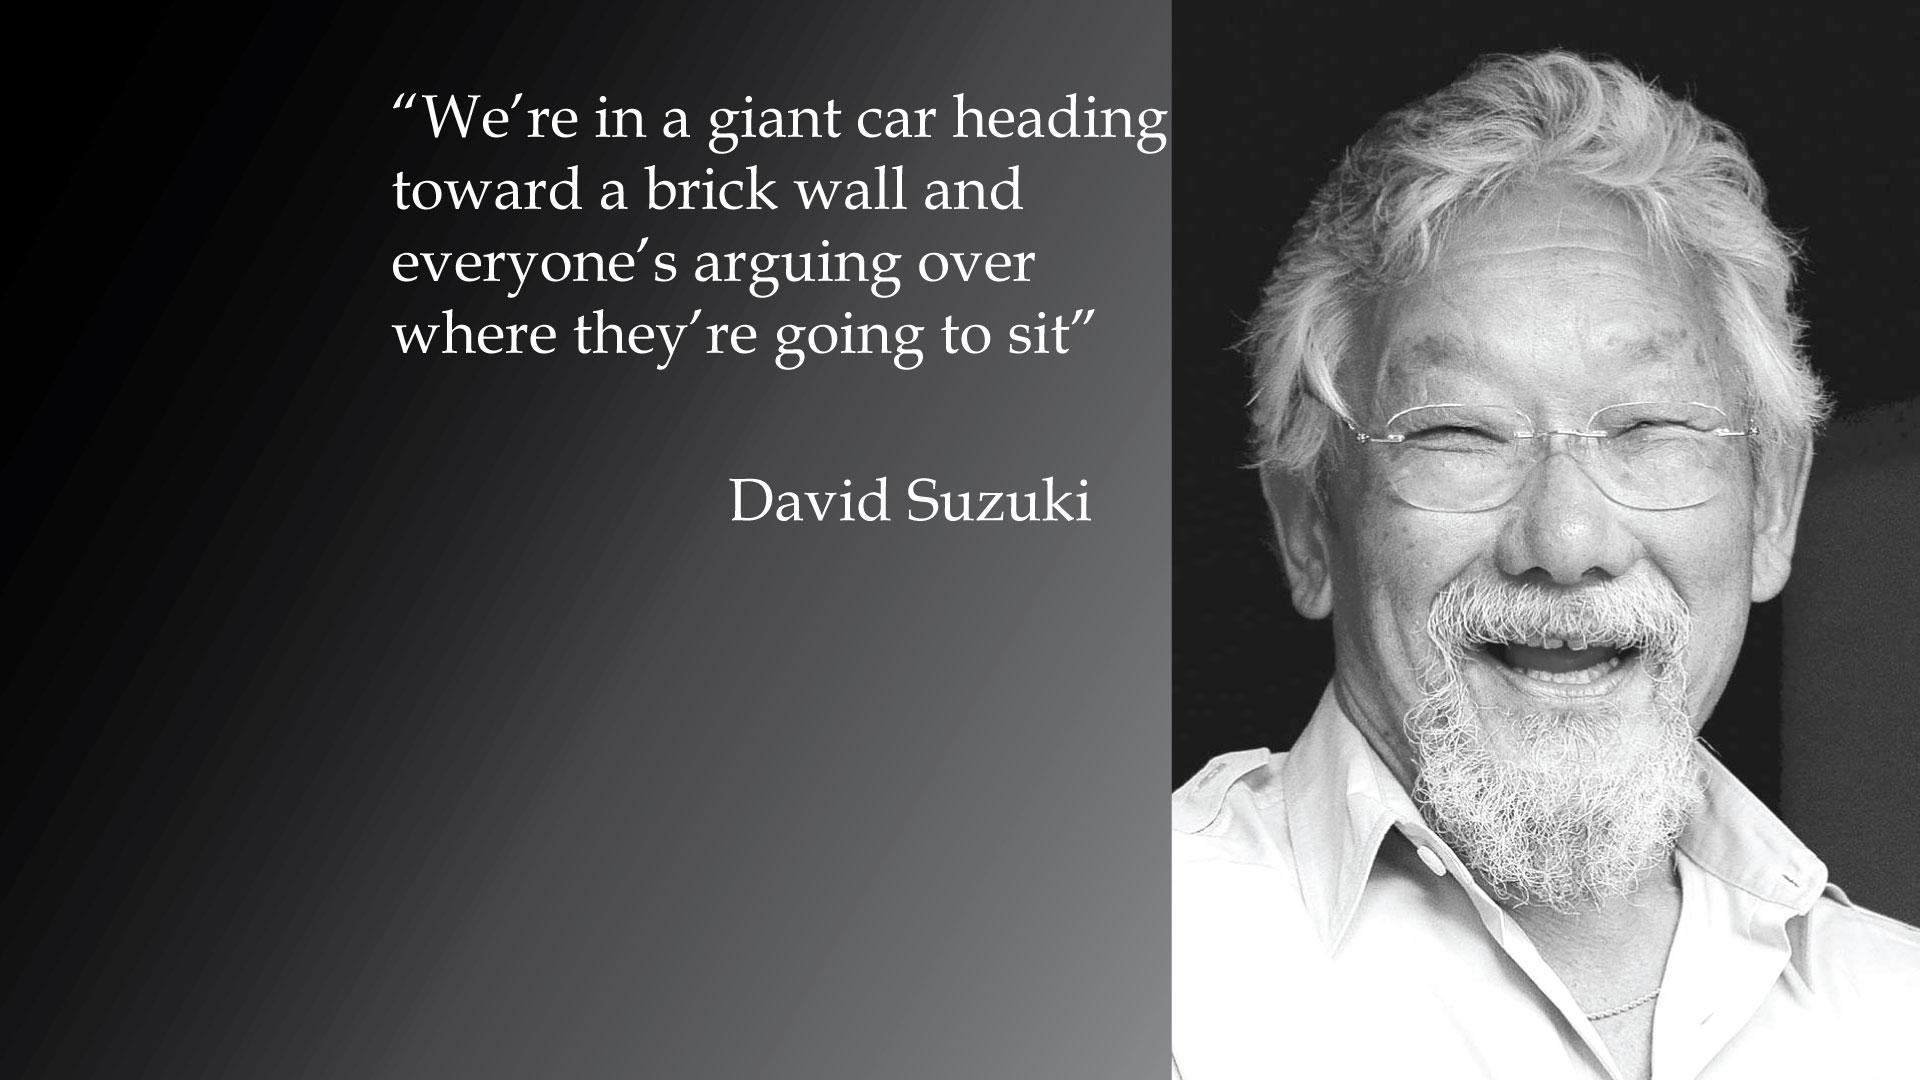 David Suzuki's quote #6